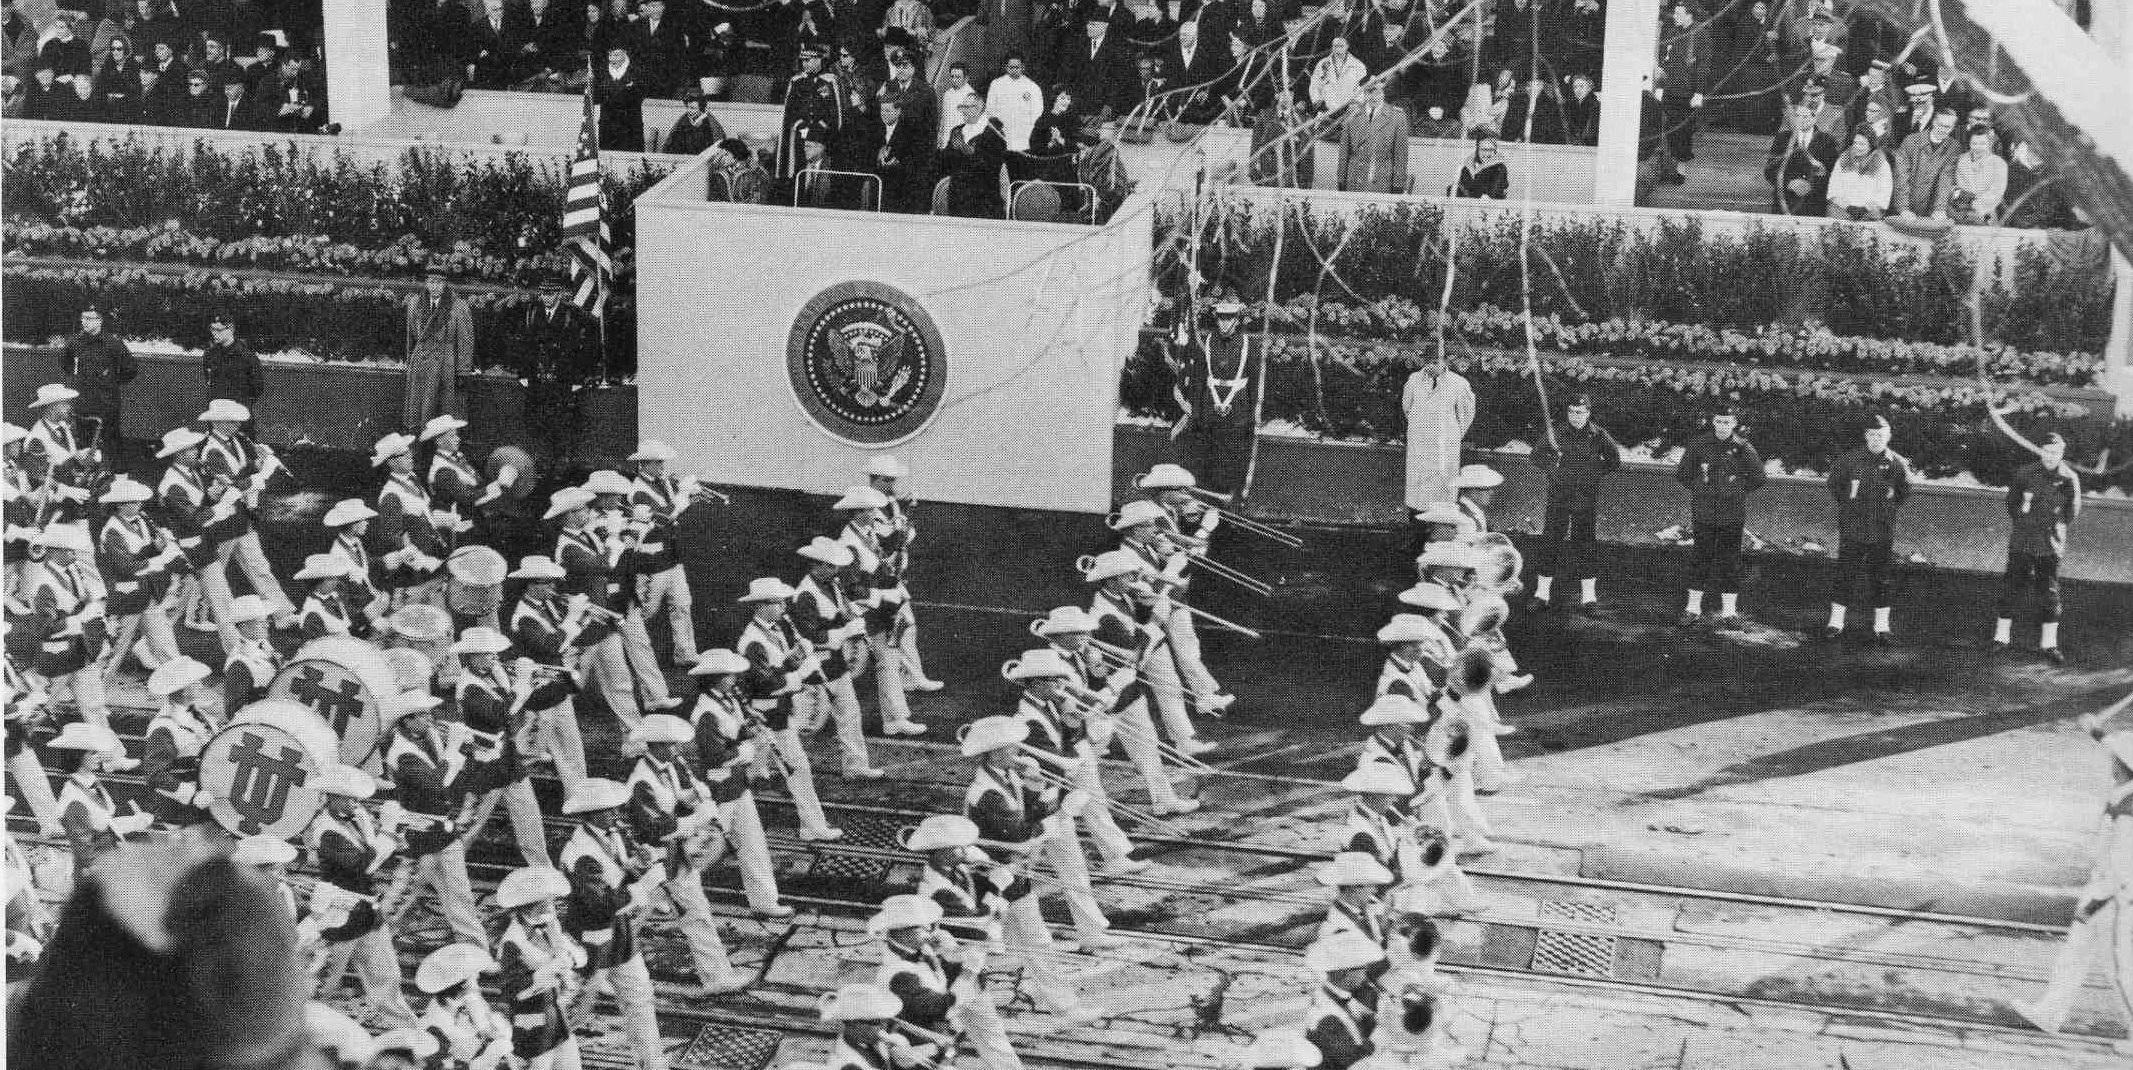 Longhorn Band marching in JFK's inaugural parade